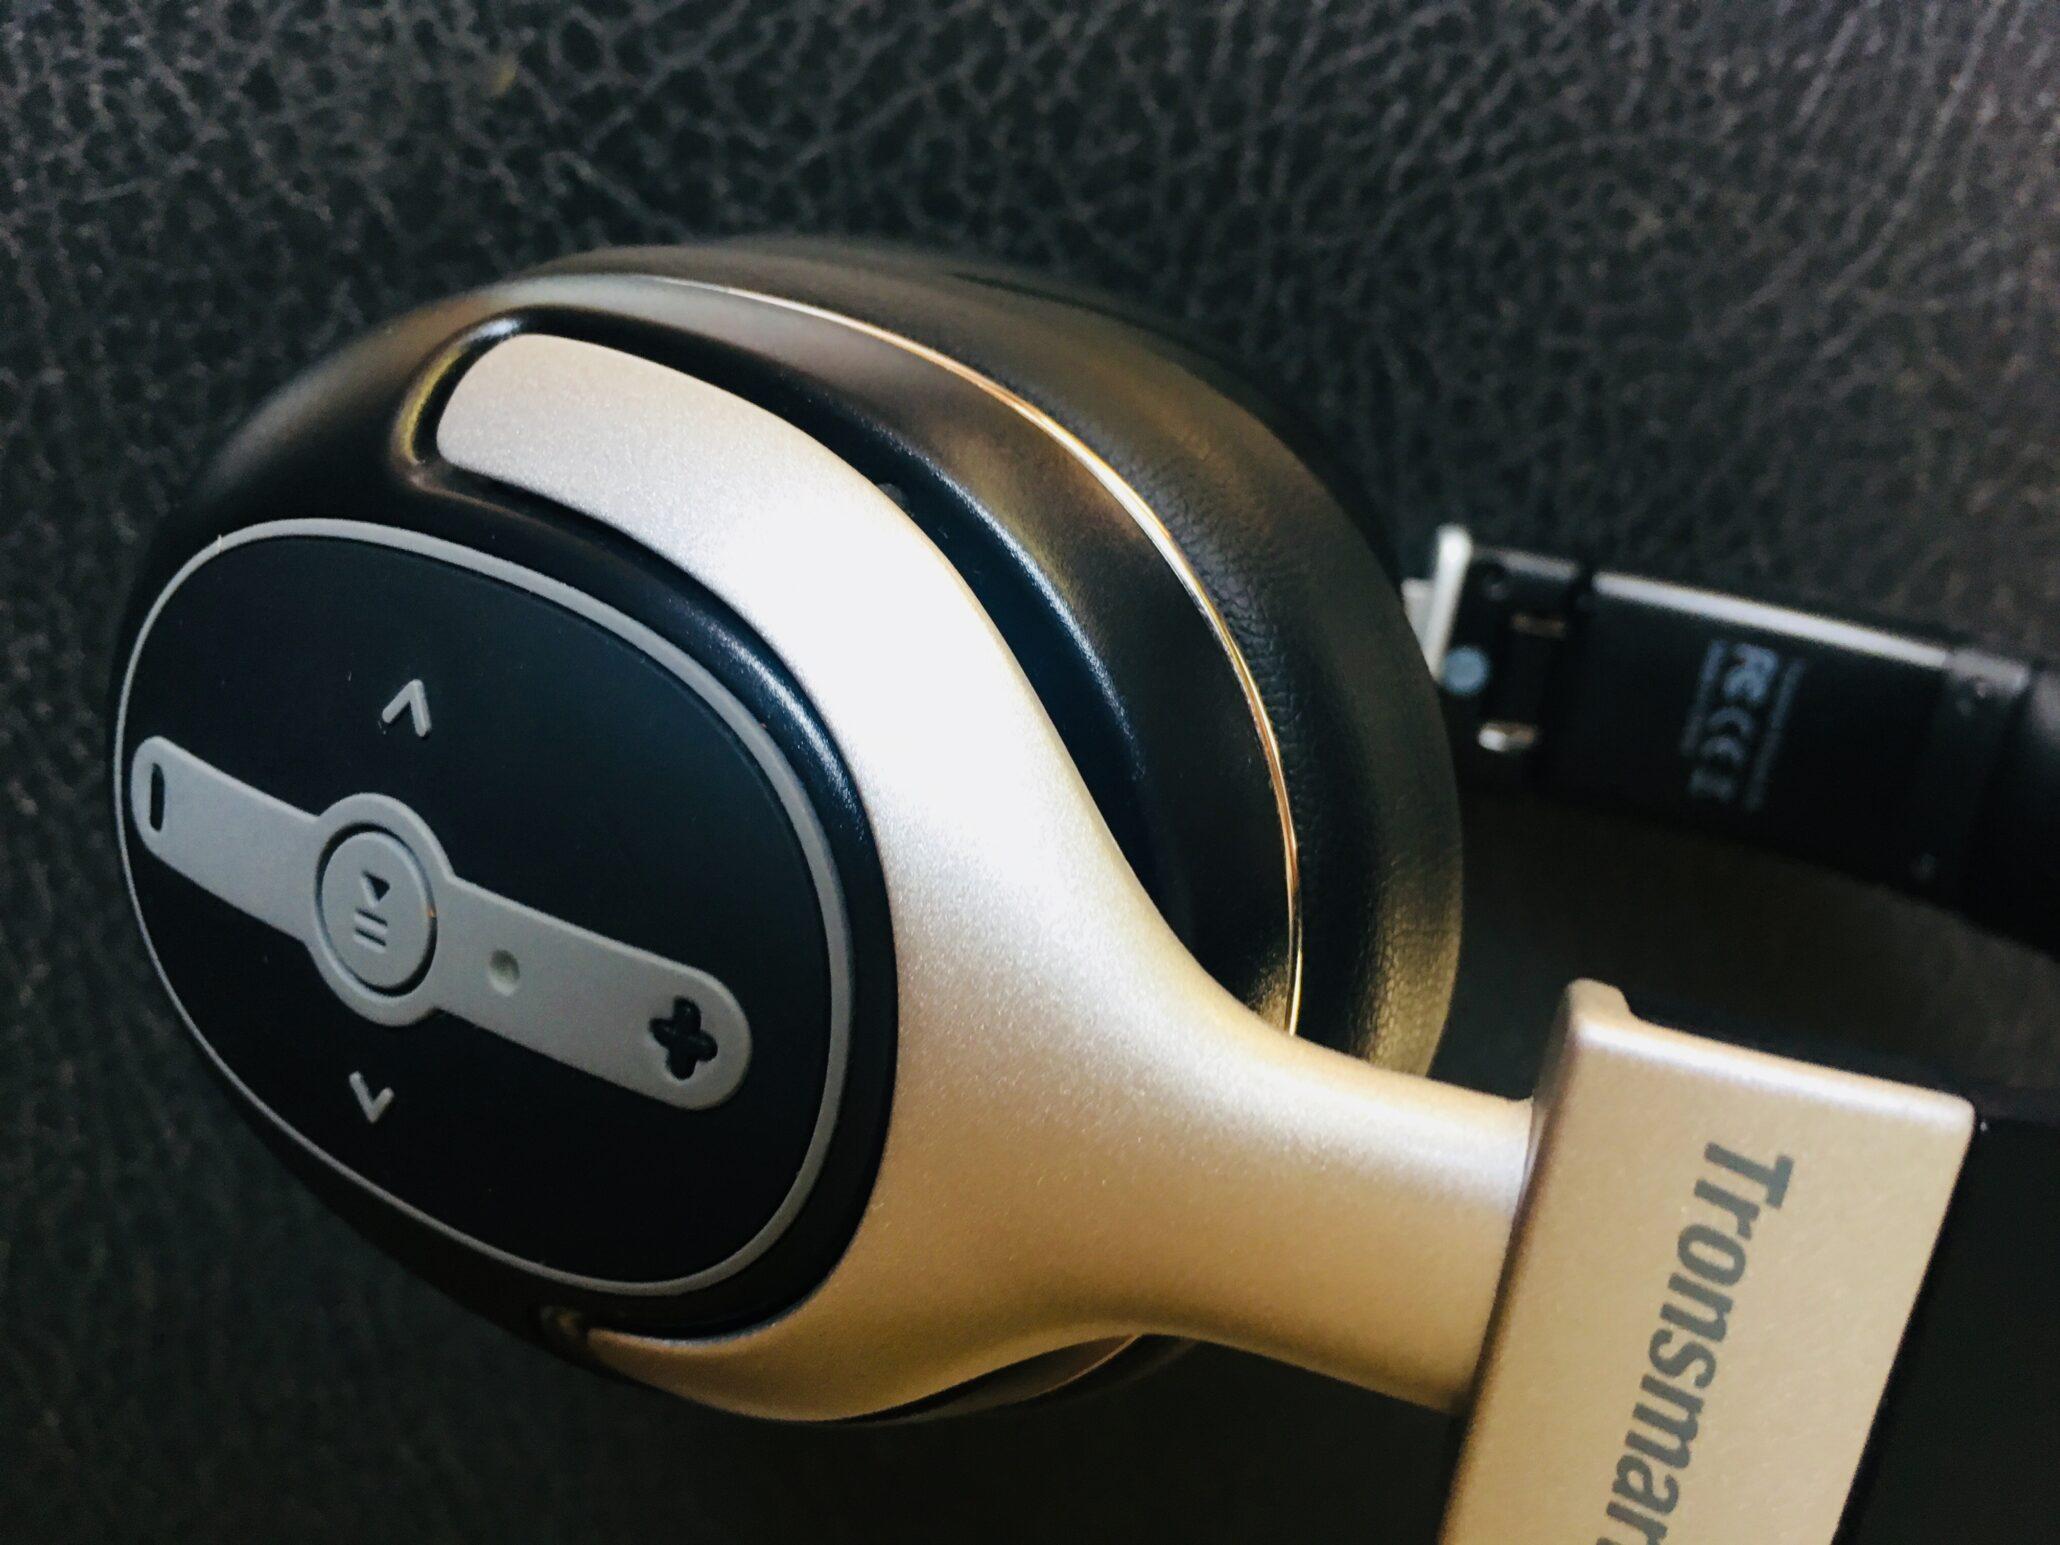 tronsmart wireless headphones